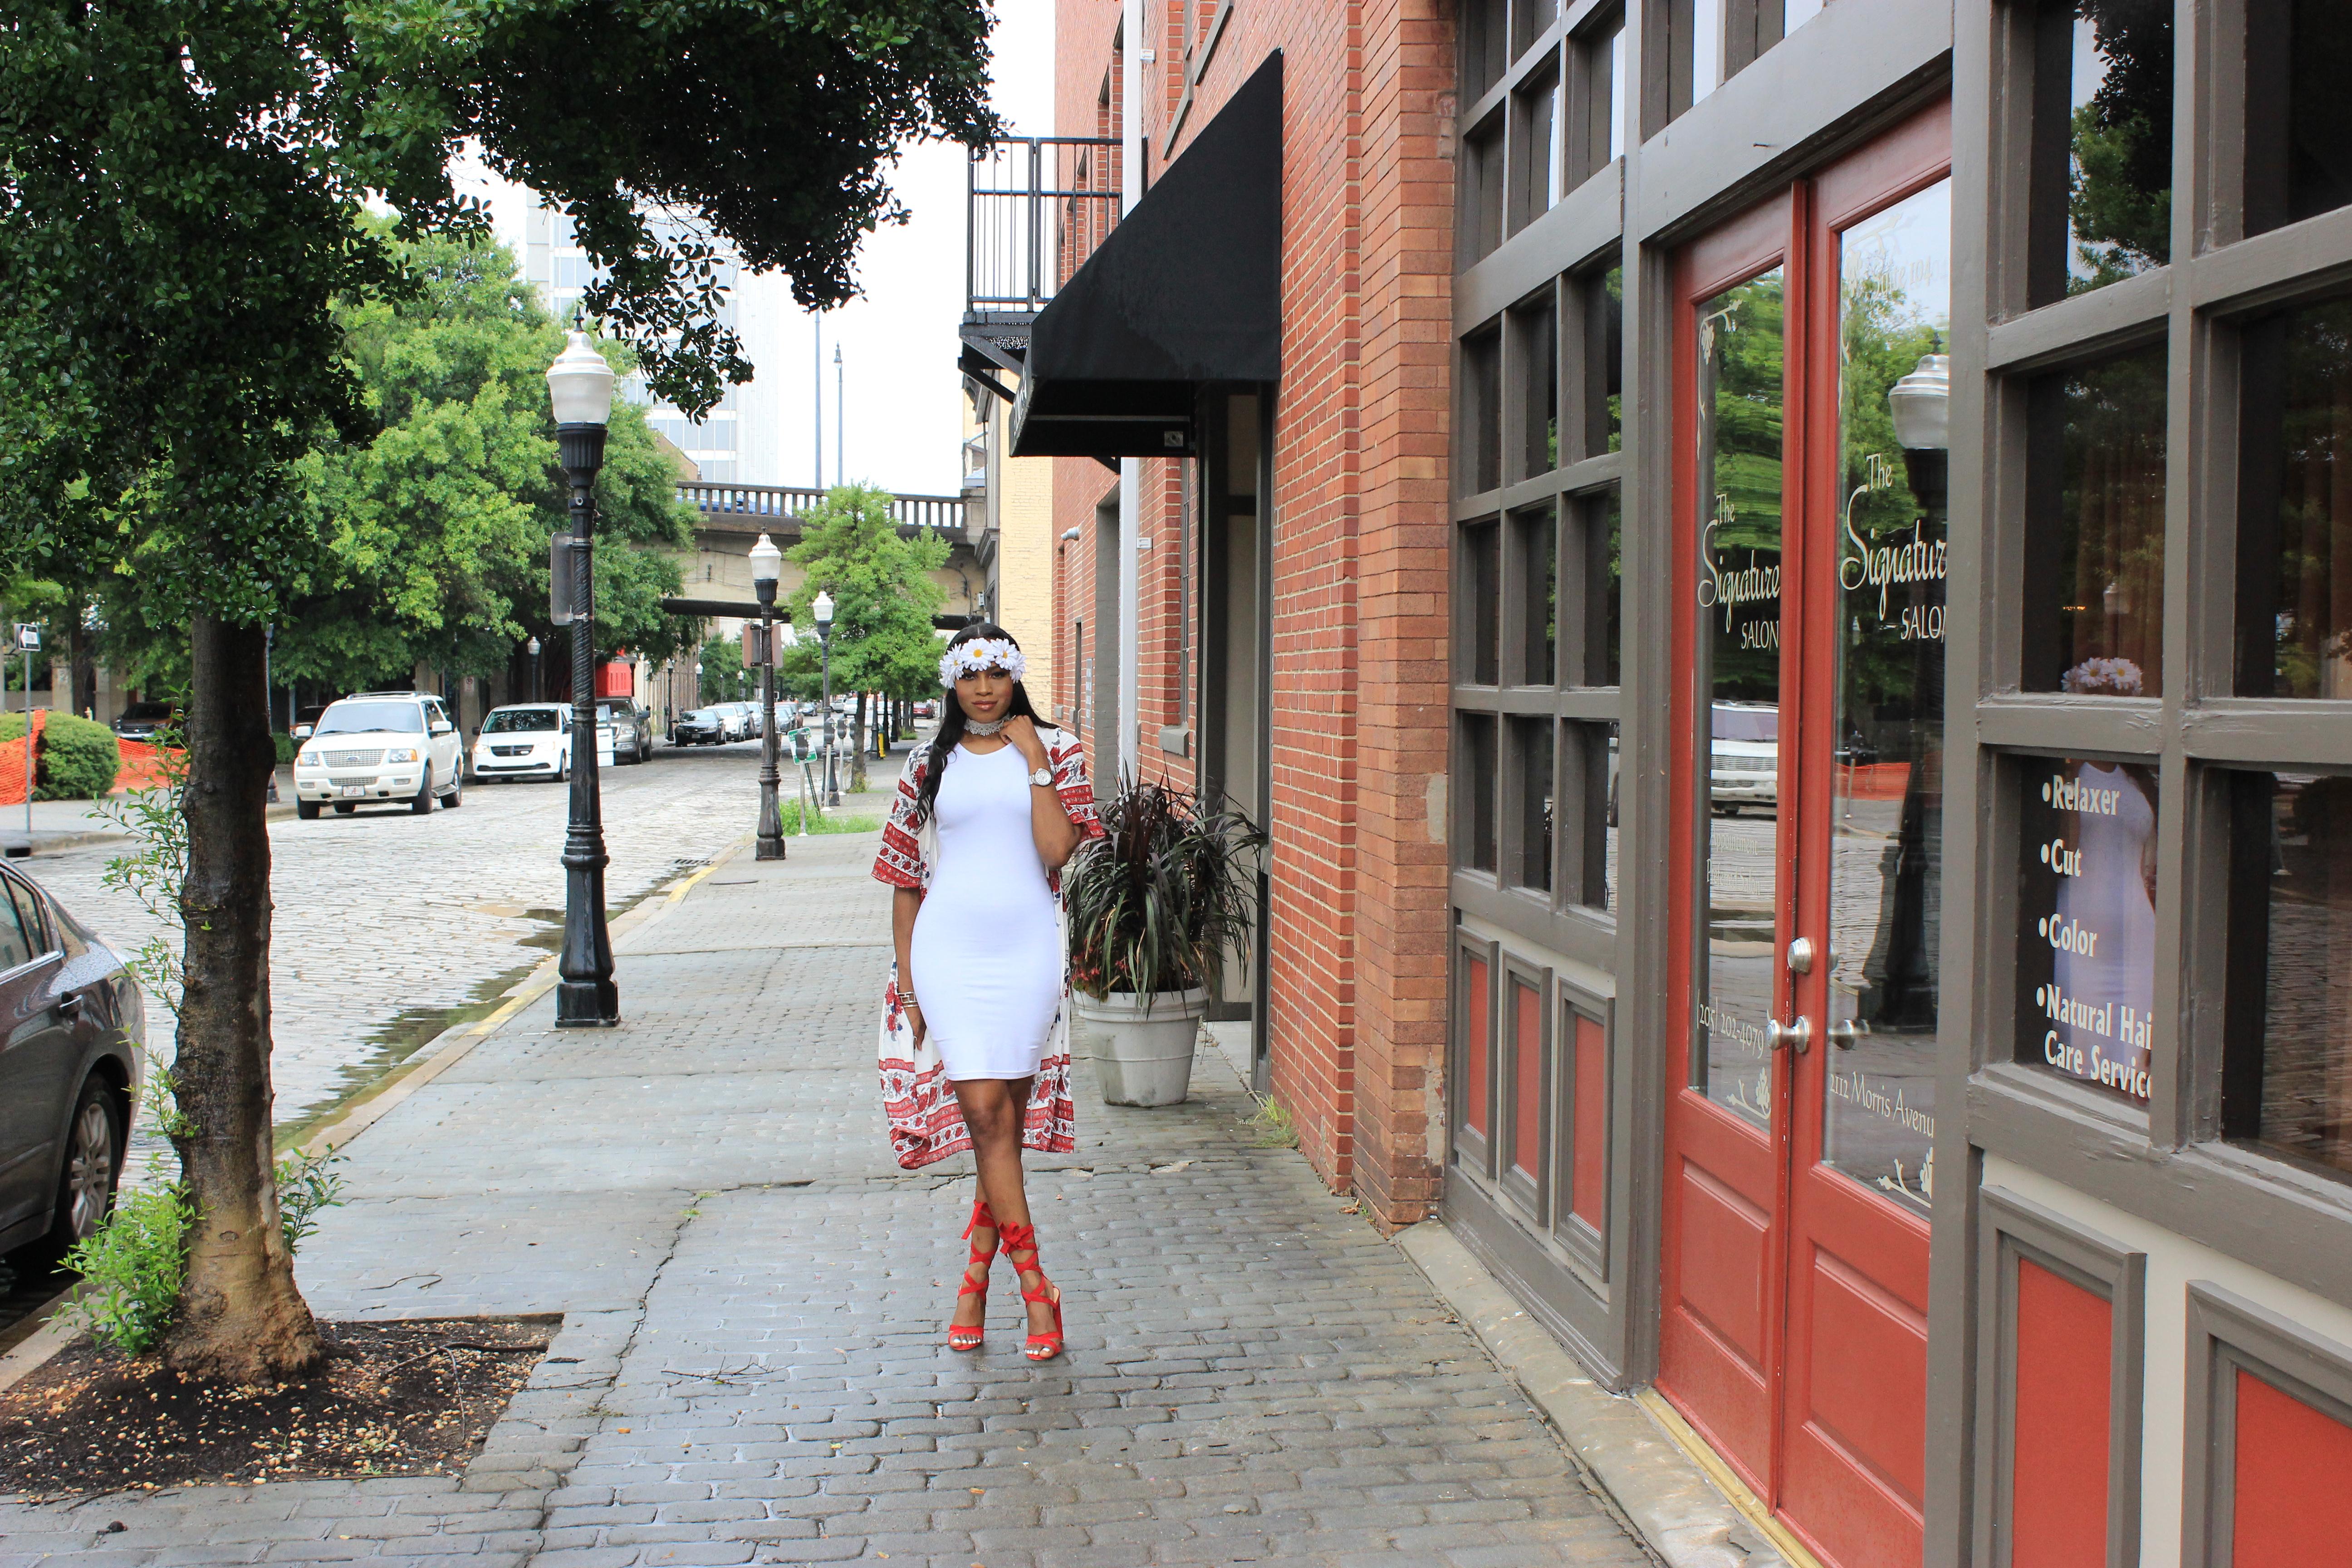 Style-Files-White-forever21-sleeveless-dress-boohoo-Lucy Border Print Maxi Shortsleeve Kimono-Boohoo-ruby-Scalloped Lace Choker-Public-desire-red-lace-uP-heels-forever-21-daisy-headband-oohlalablog-16